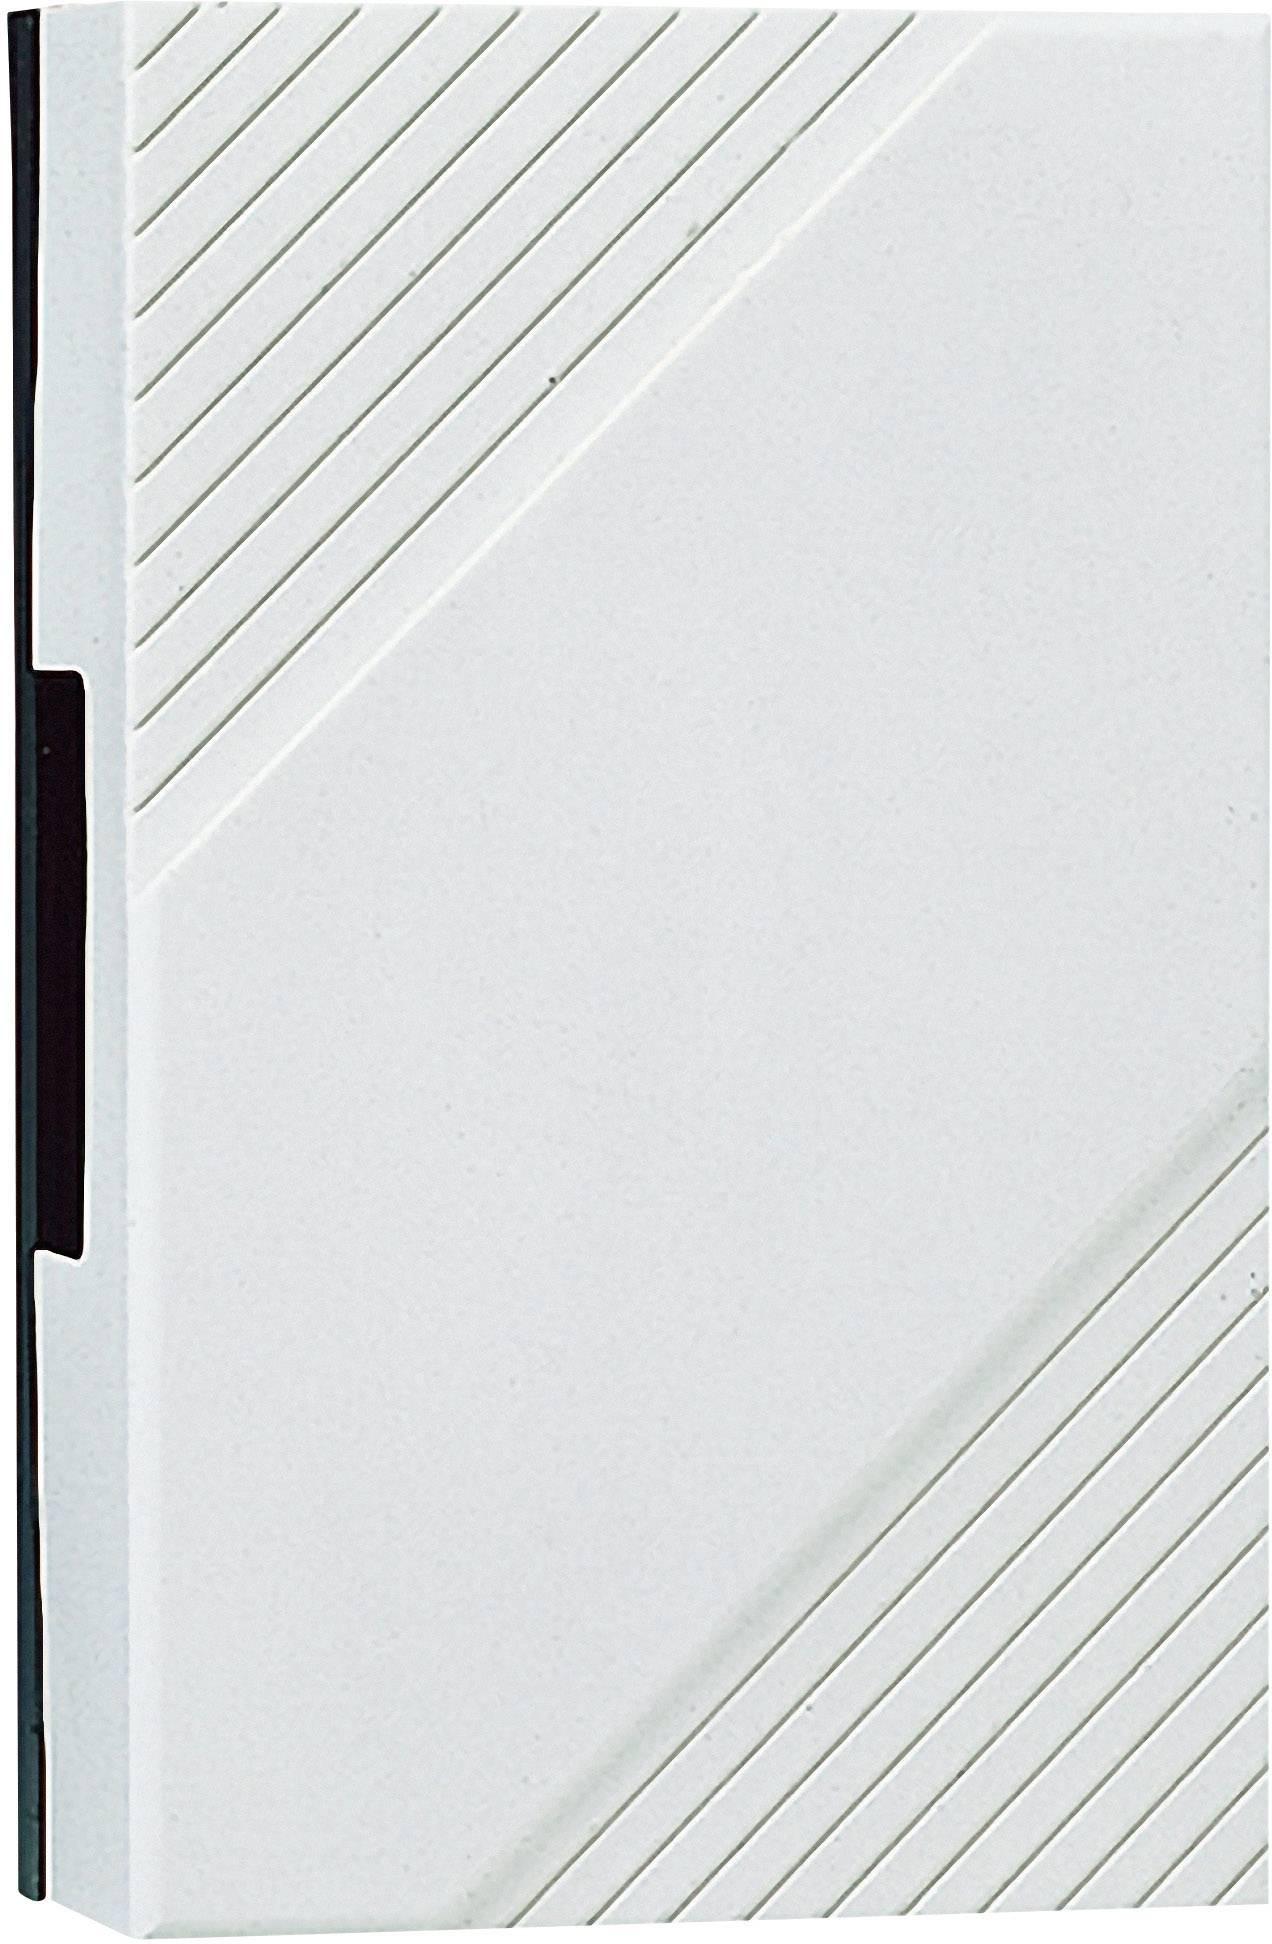 Gong Grothe Gong 169 Bw 44169, 8 - 12 V, 85 dB (A), biela